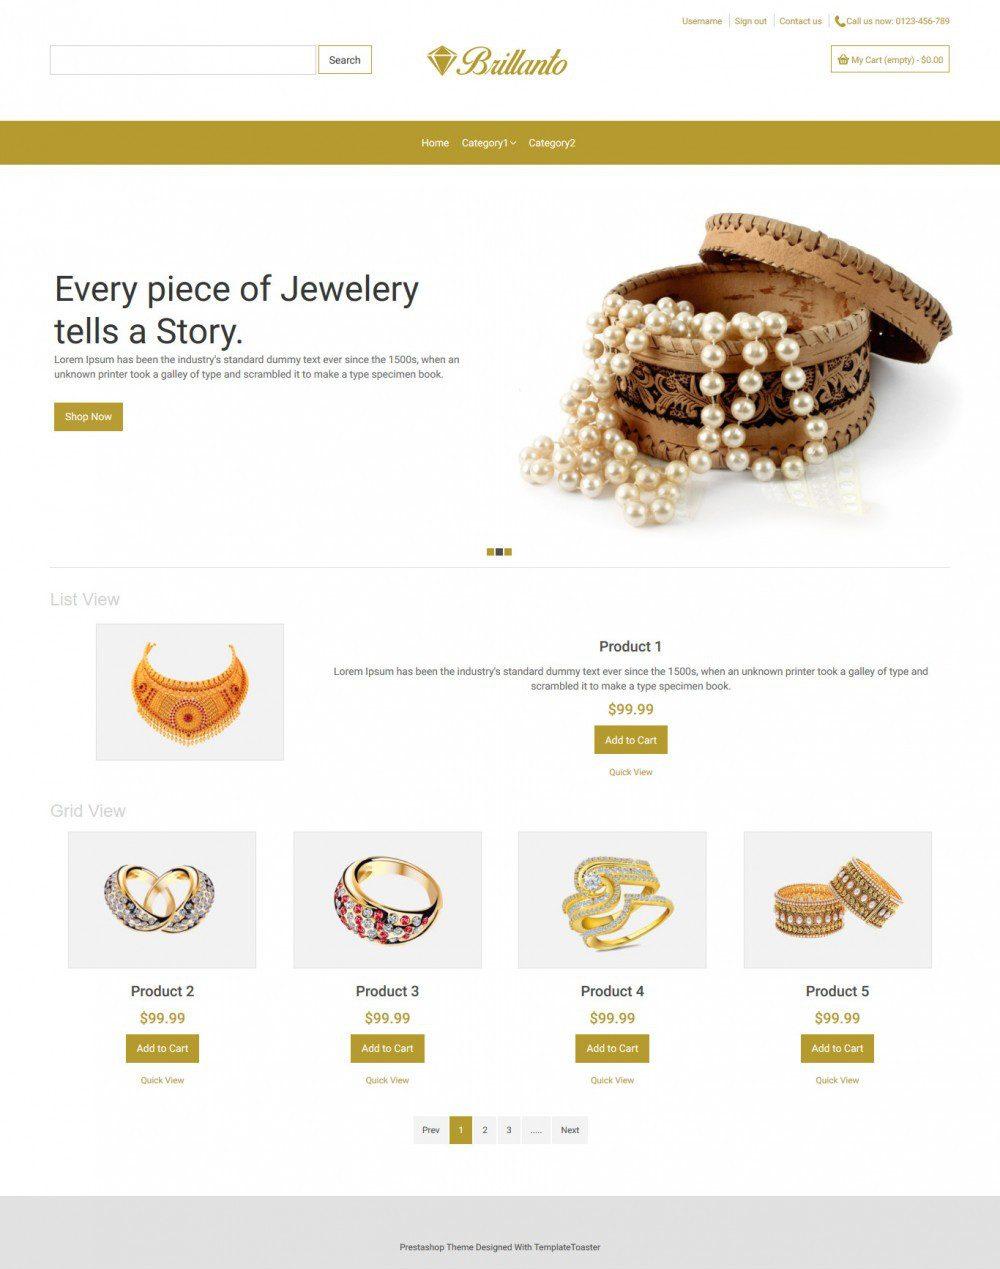 Brillanto Jewellery Store Virtuemart Template